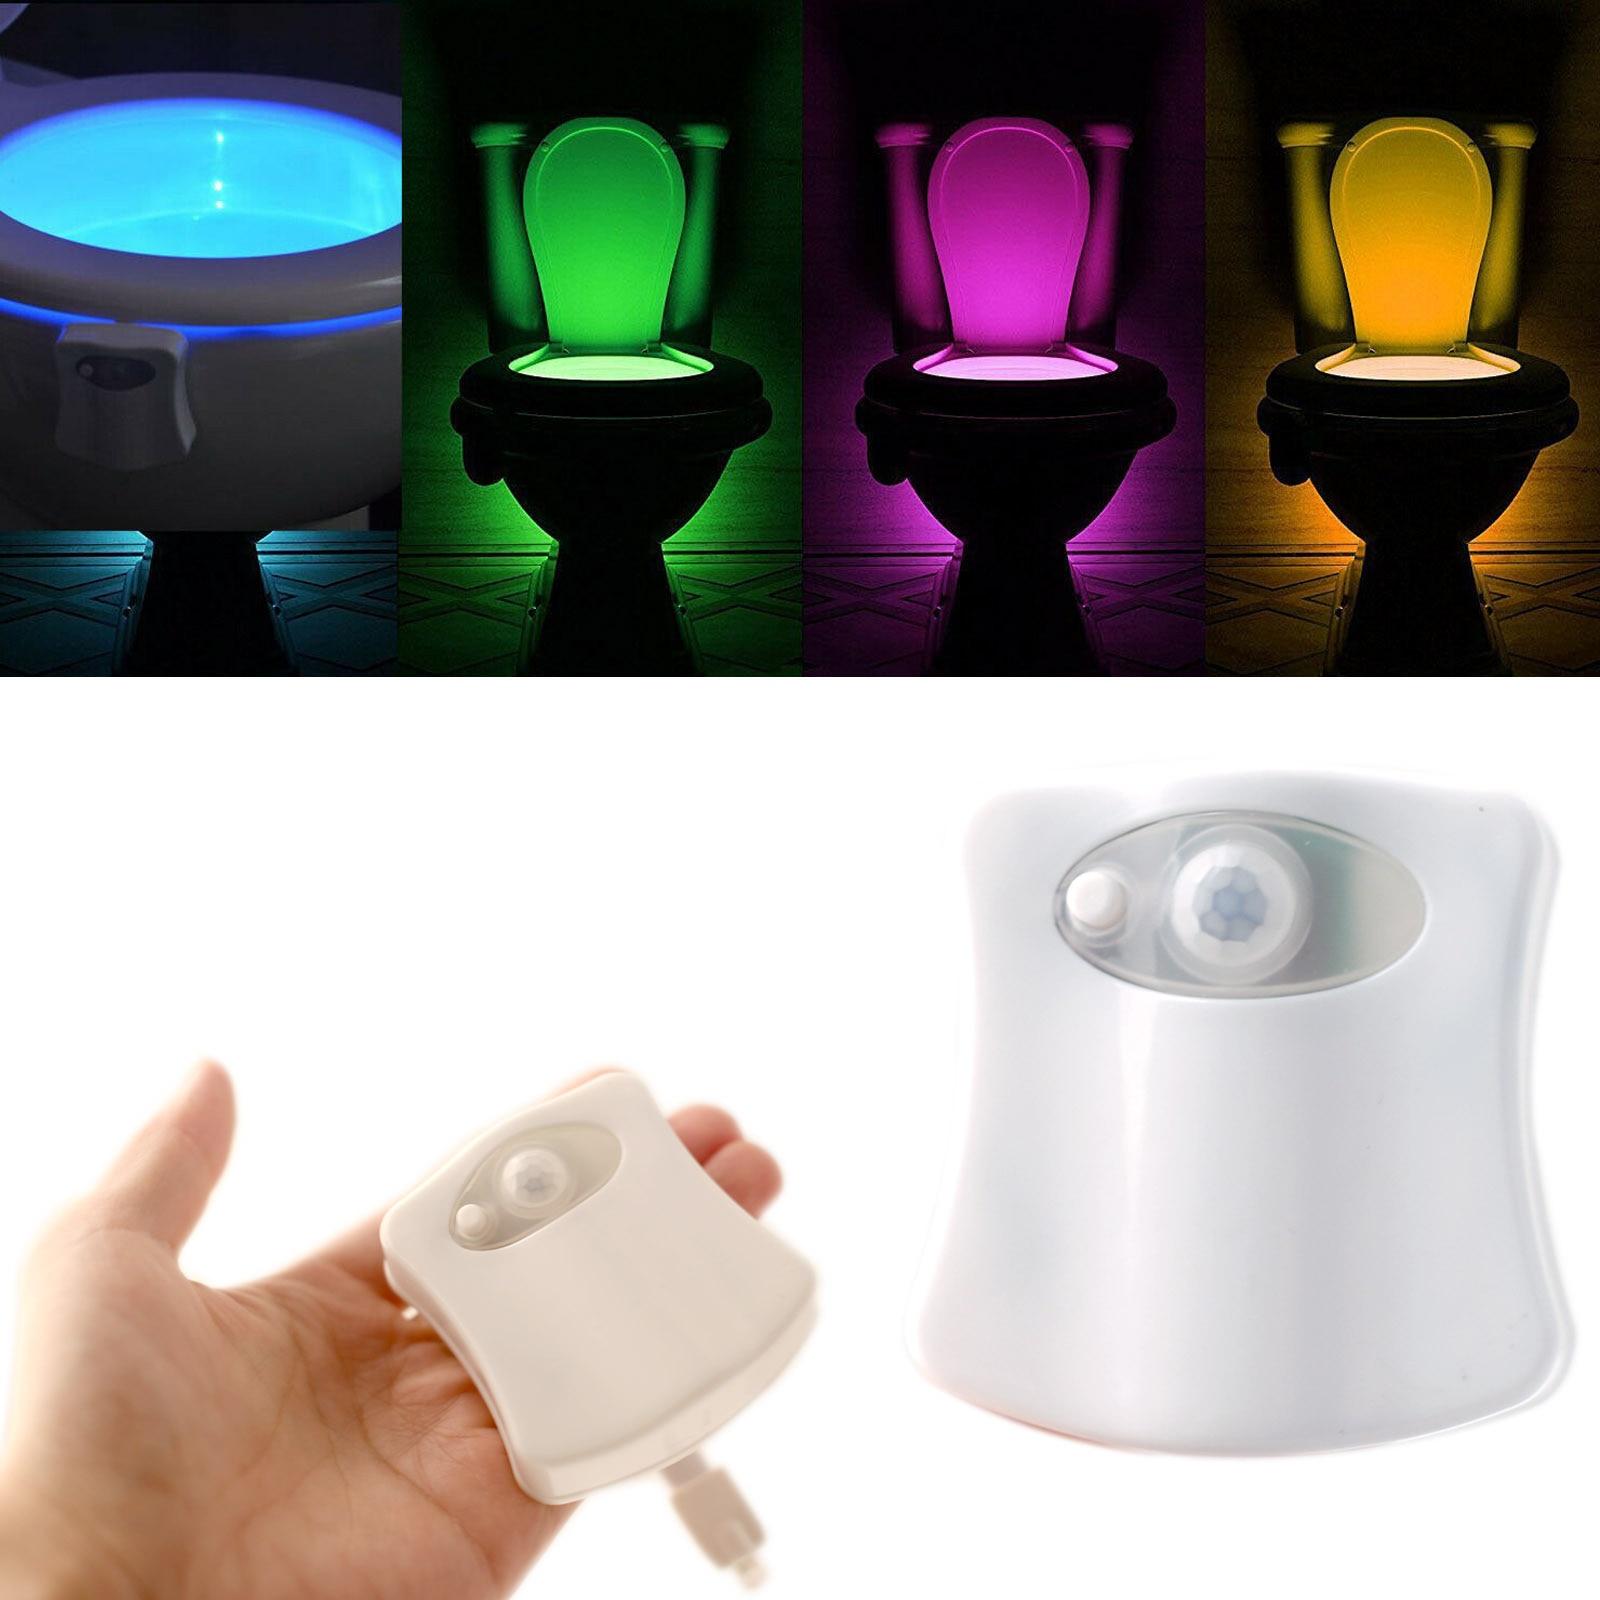 8 Colors PIR Motion Sensor Smart Toilet Seat Night Light Waterproof Backlight For Toilet Bowl LED Luminaria Lamp WC Toilet Light